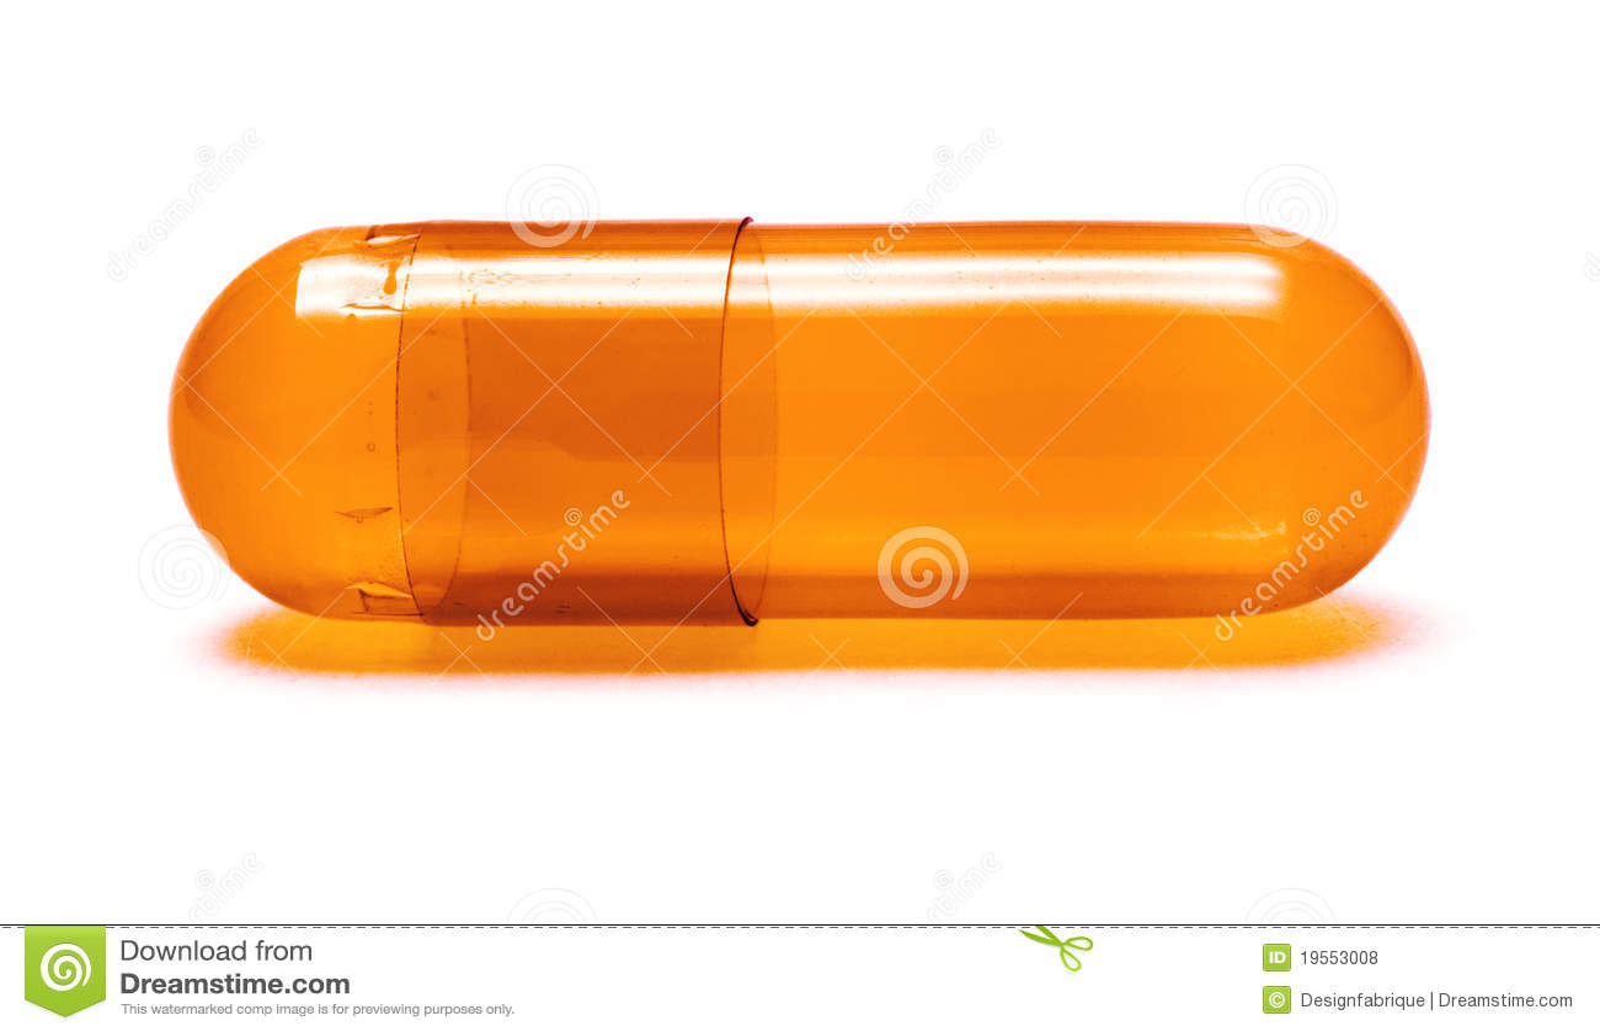 dating με πορτοκαλί μπουκάλια